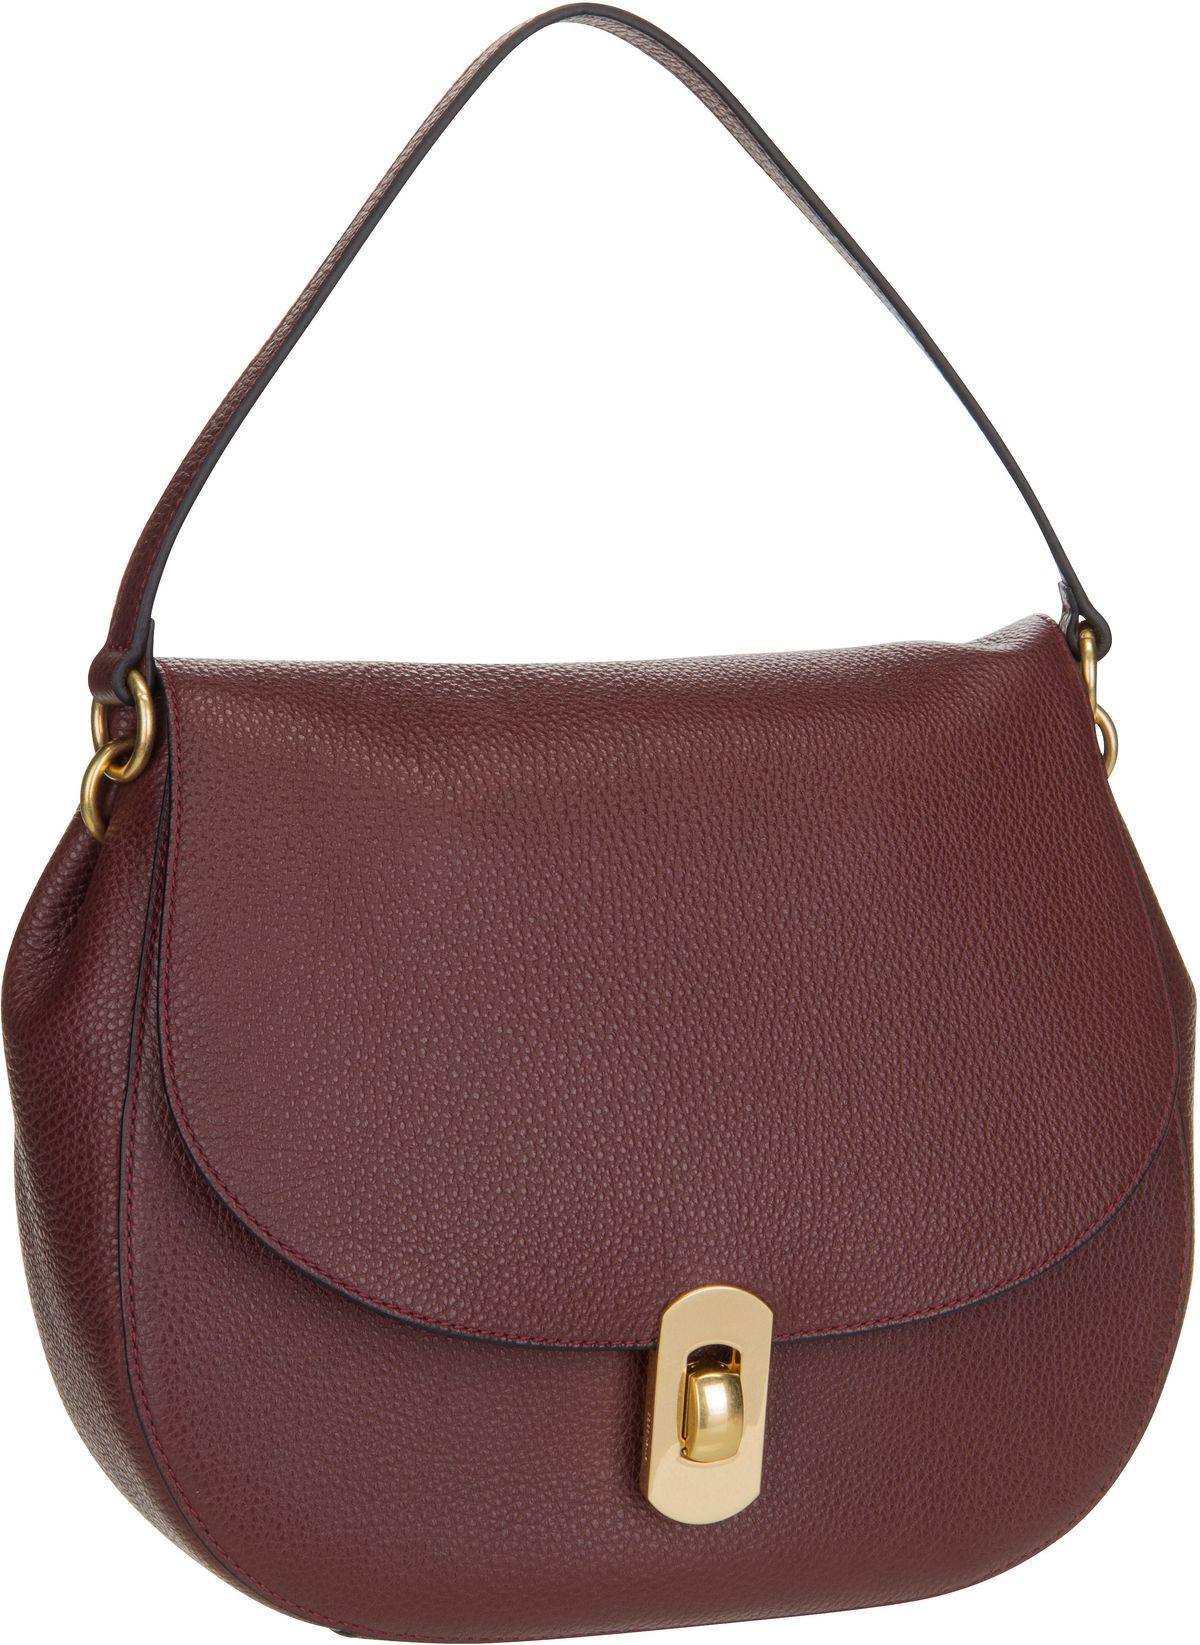 Handtasche Zaniah 1501 Marsala